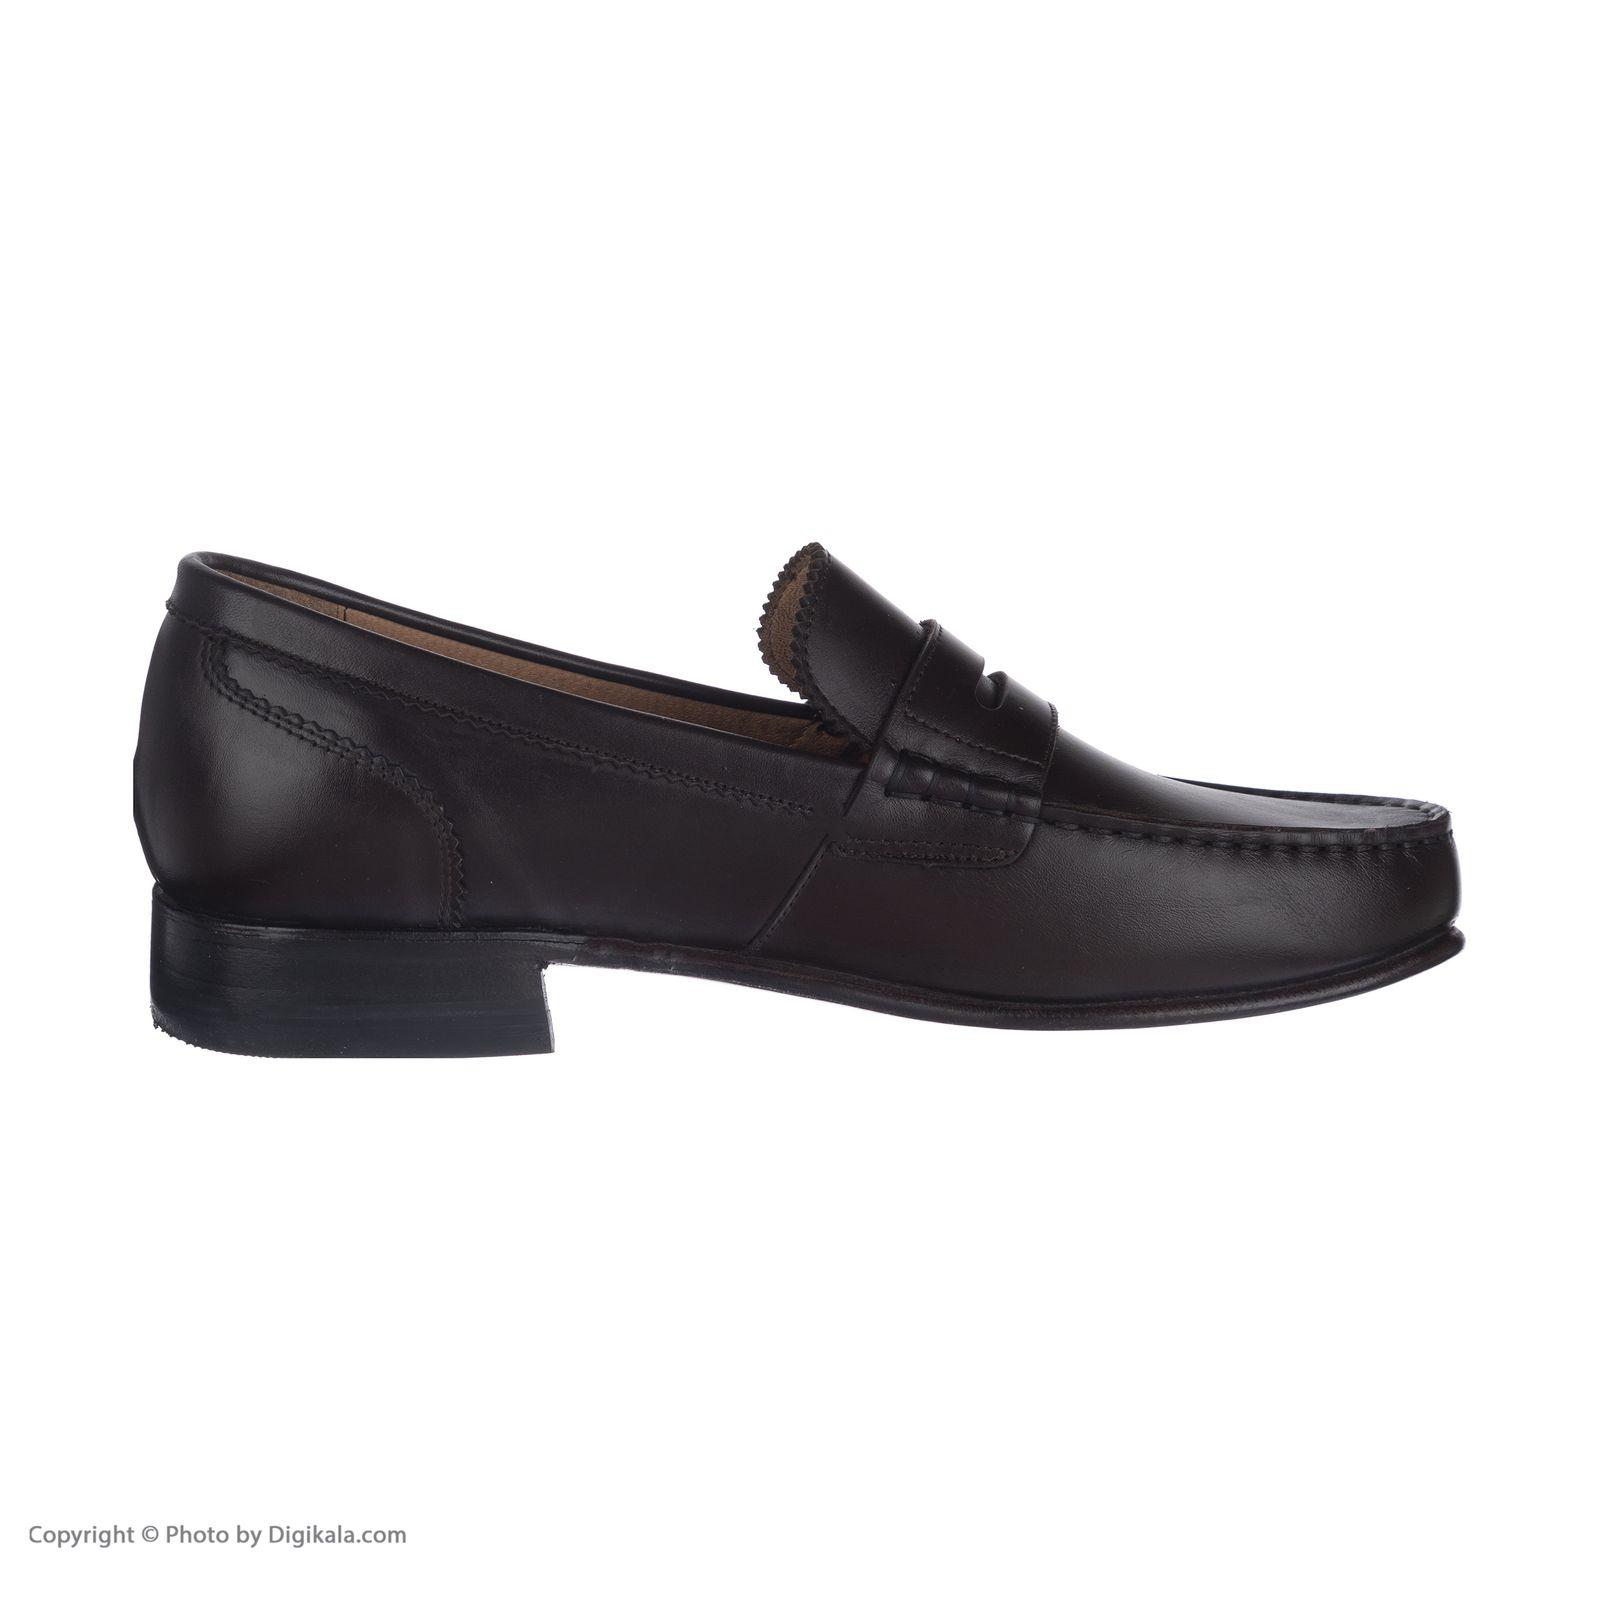 کفش مردانه نظری کد 436 -  - 5